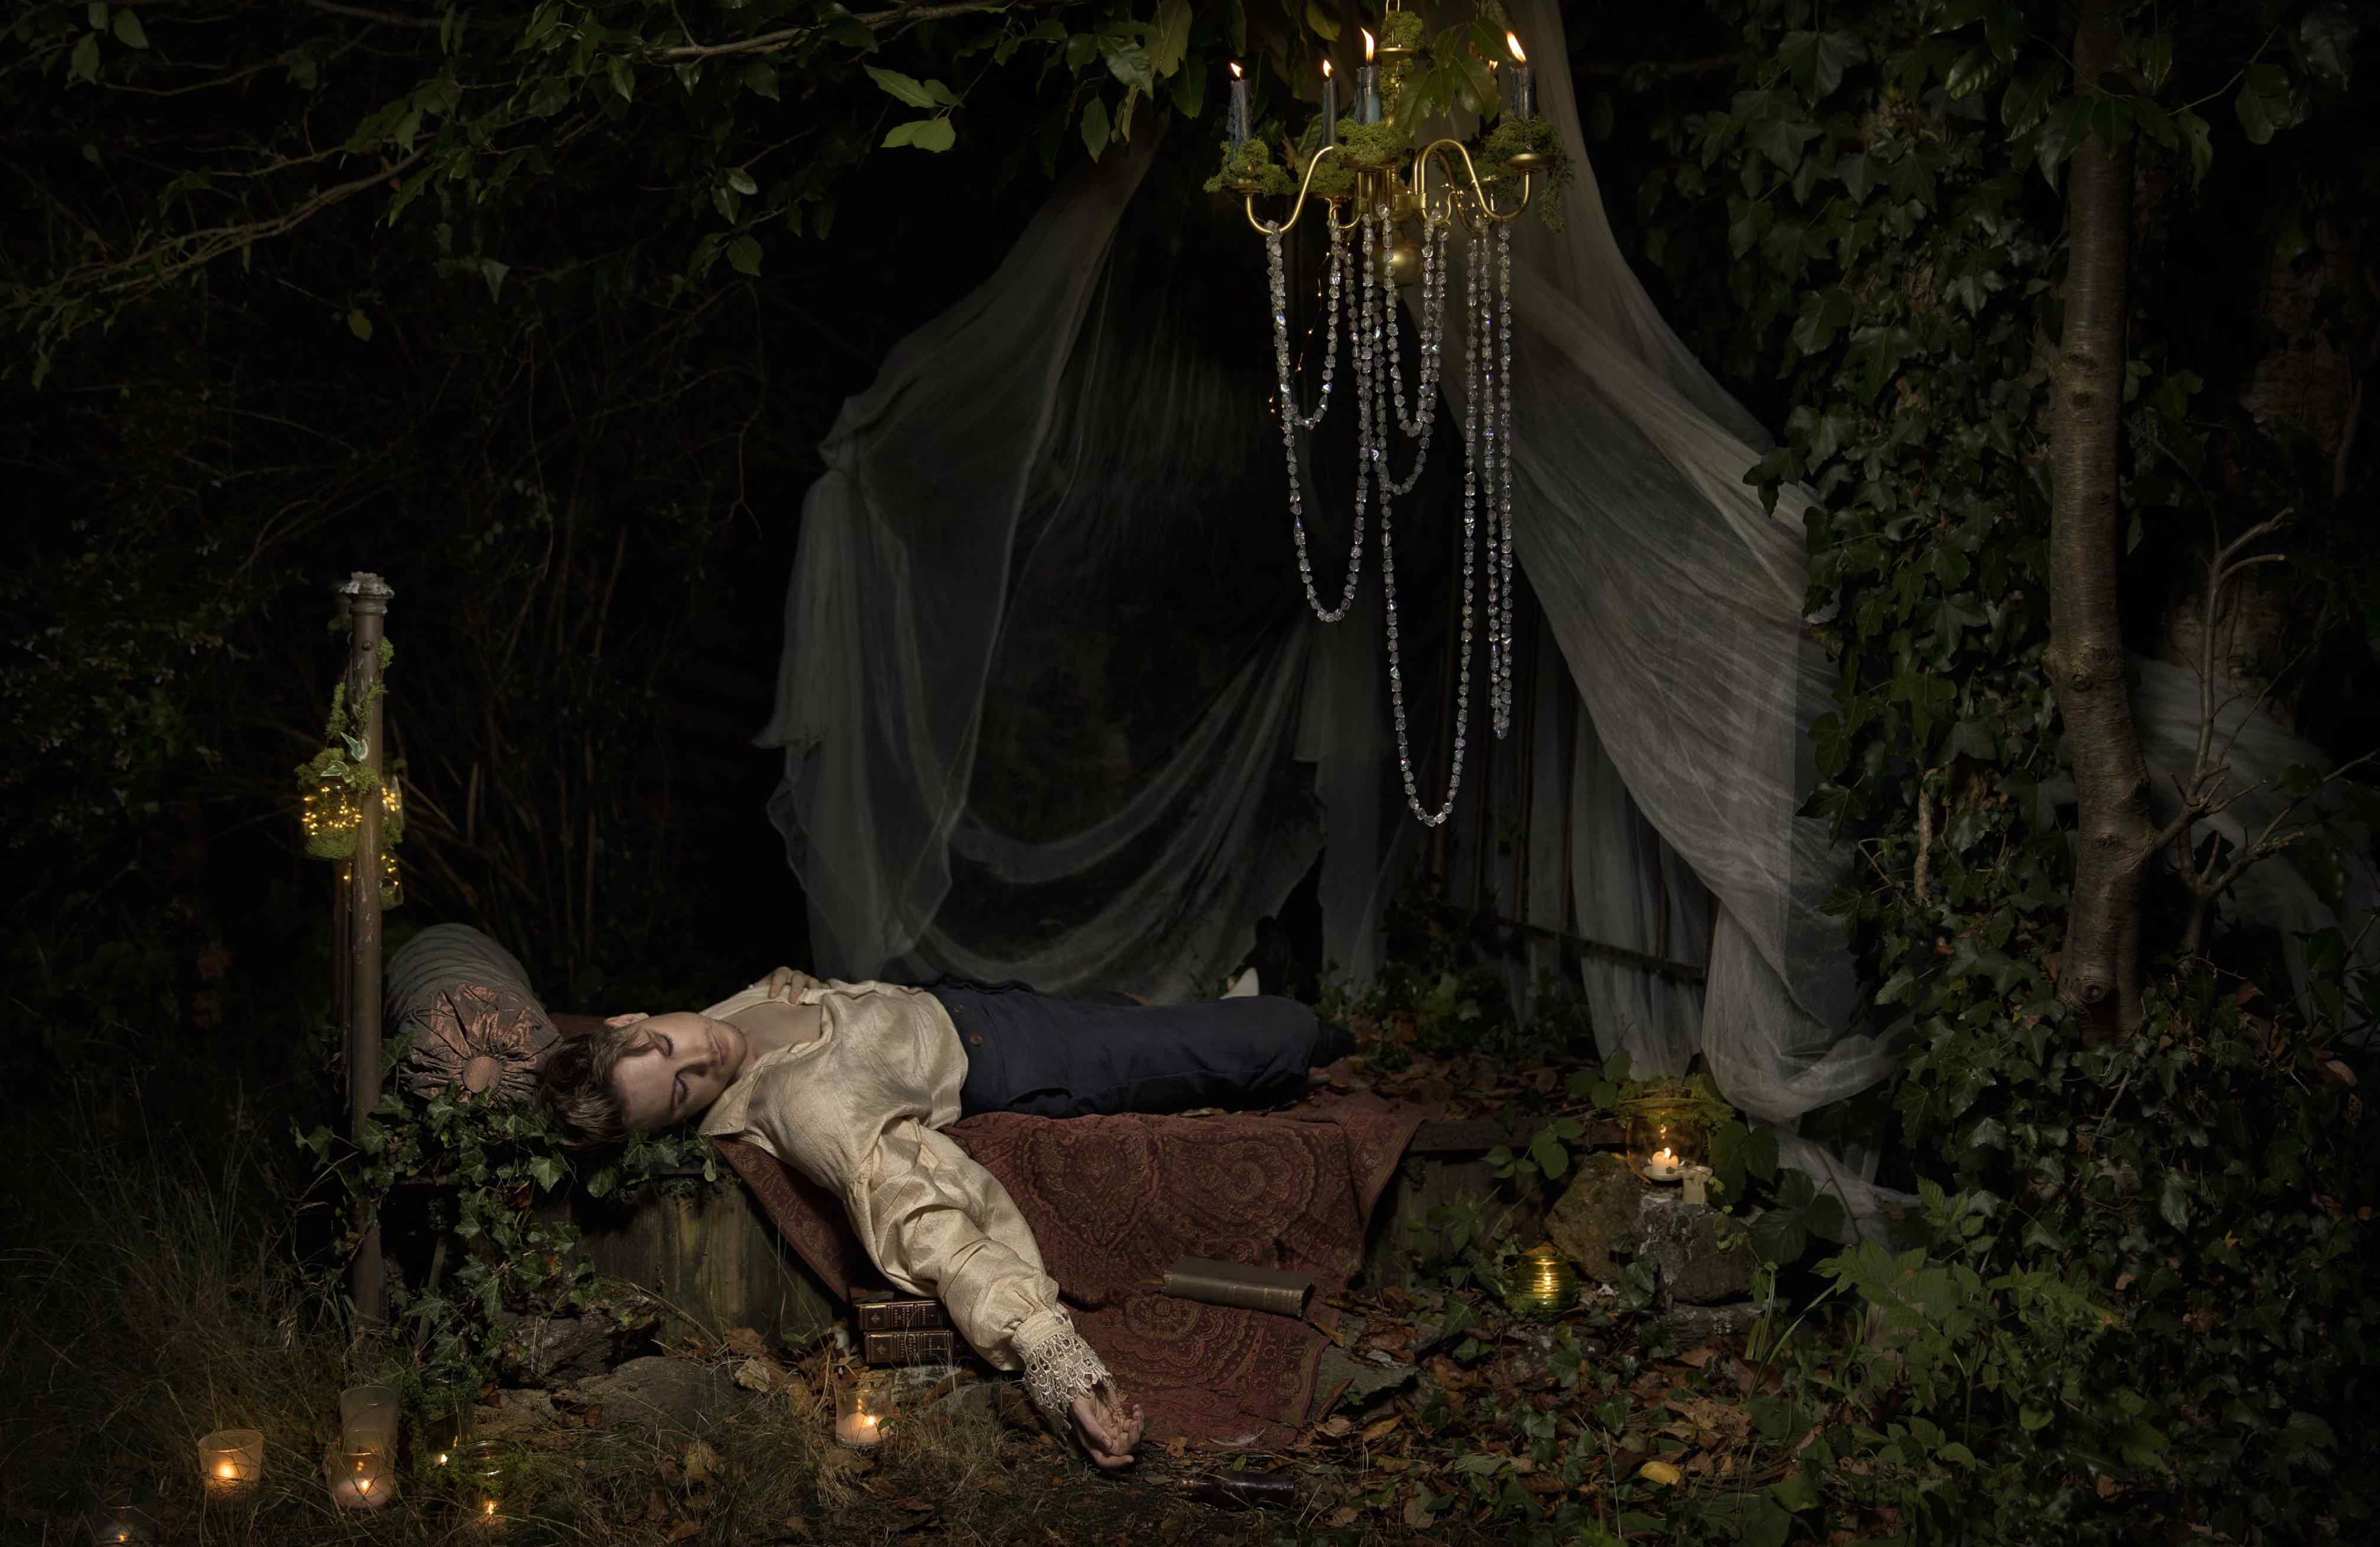 Photography by CARRI ANGEL Model IAN HENCHER